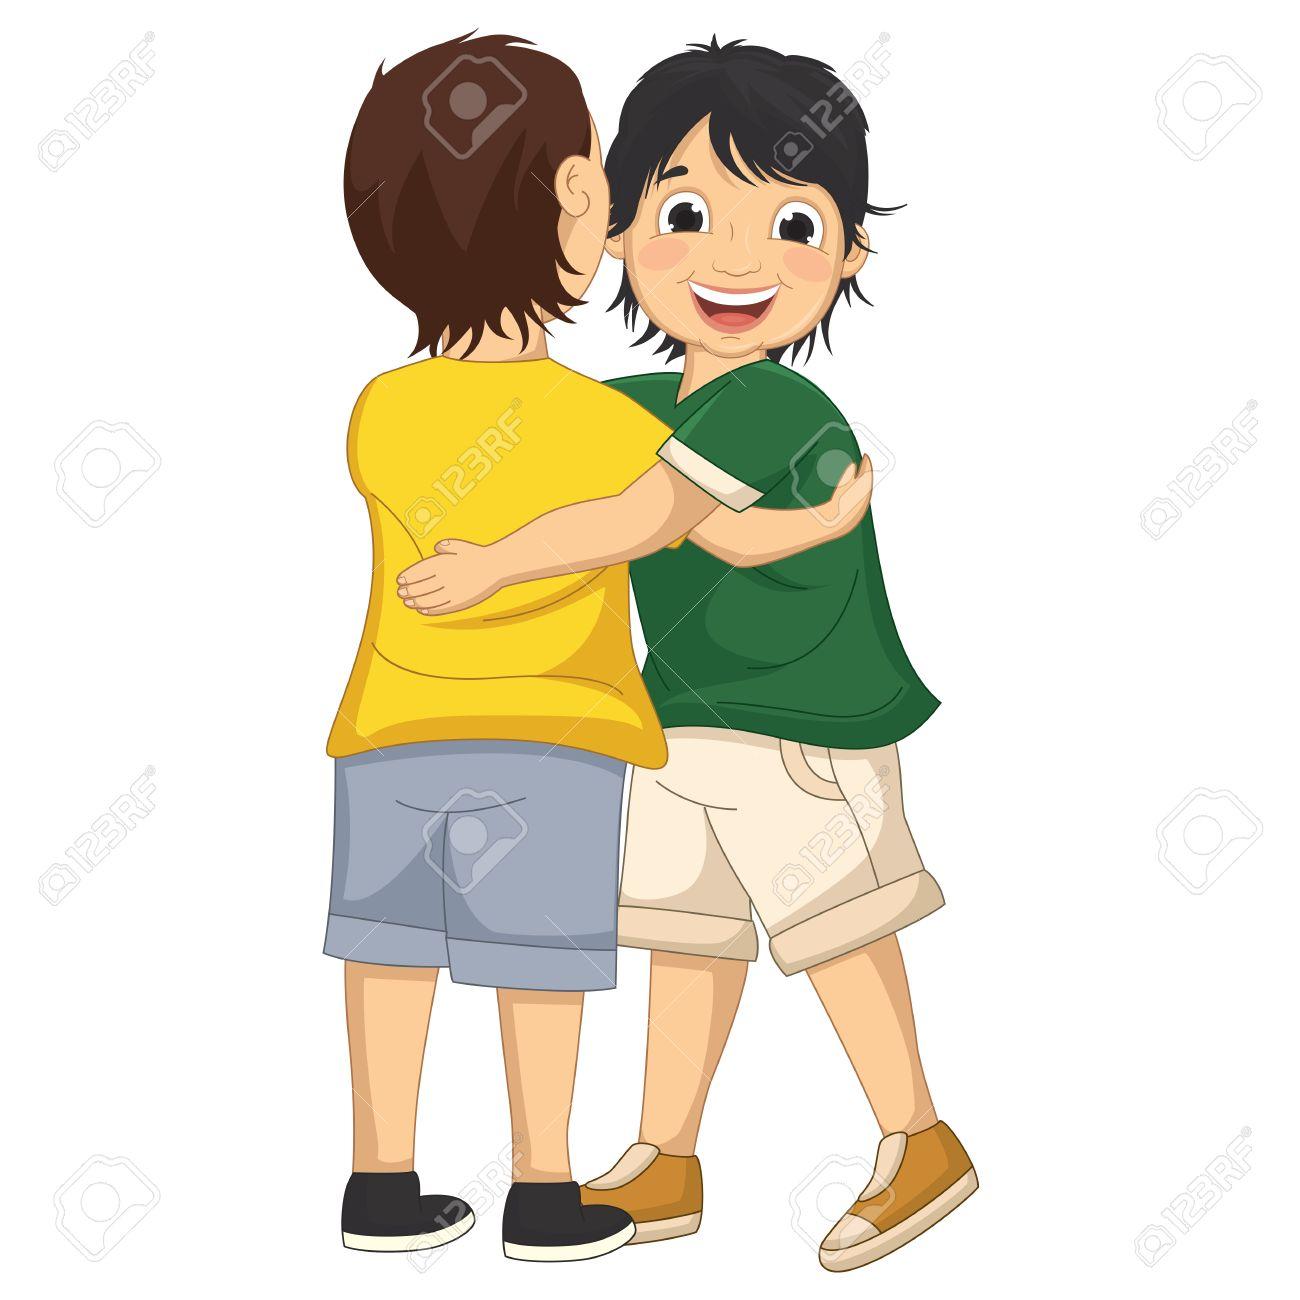 Kids hugging clipart » Clipart Station.